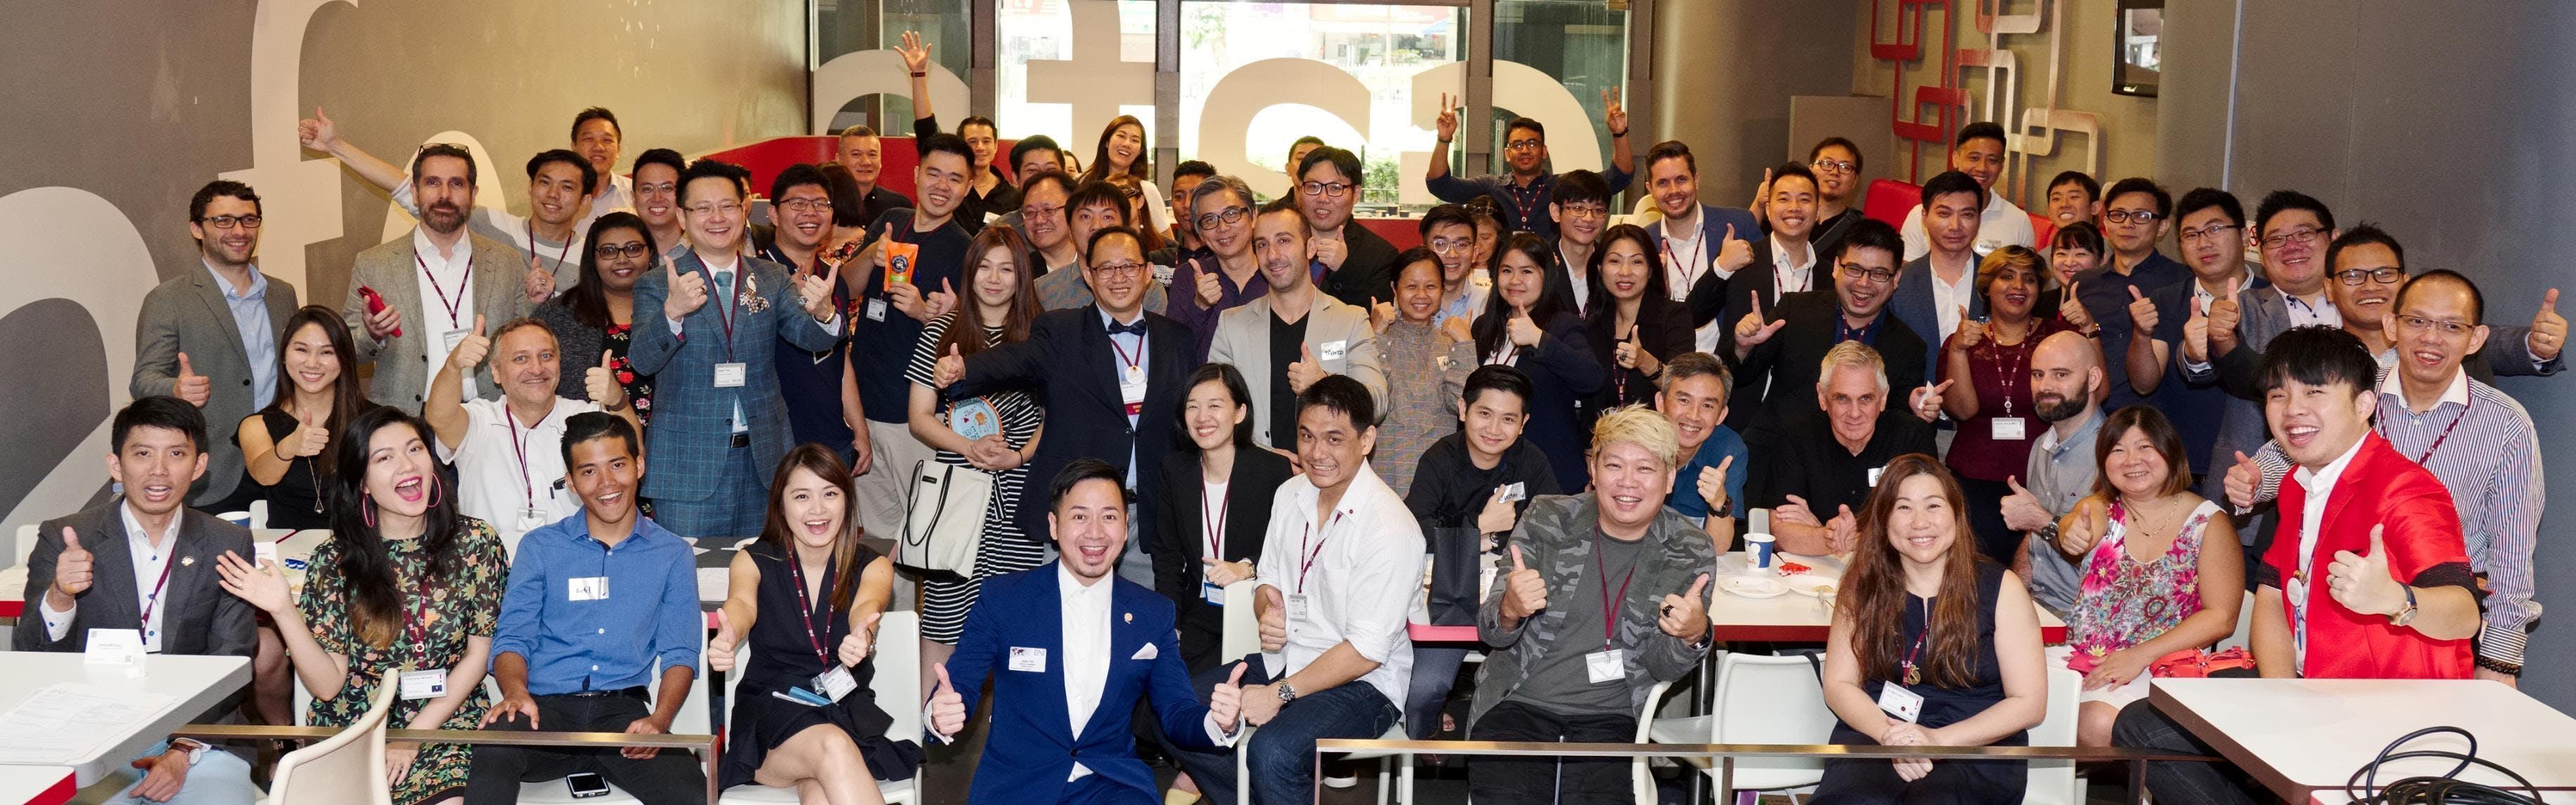 BNI Champions Networking Event